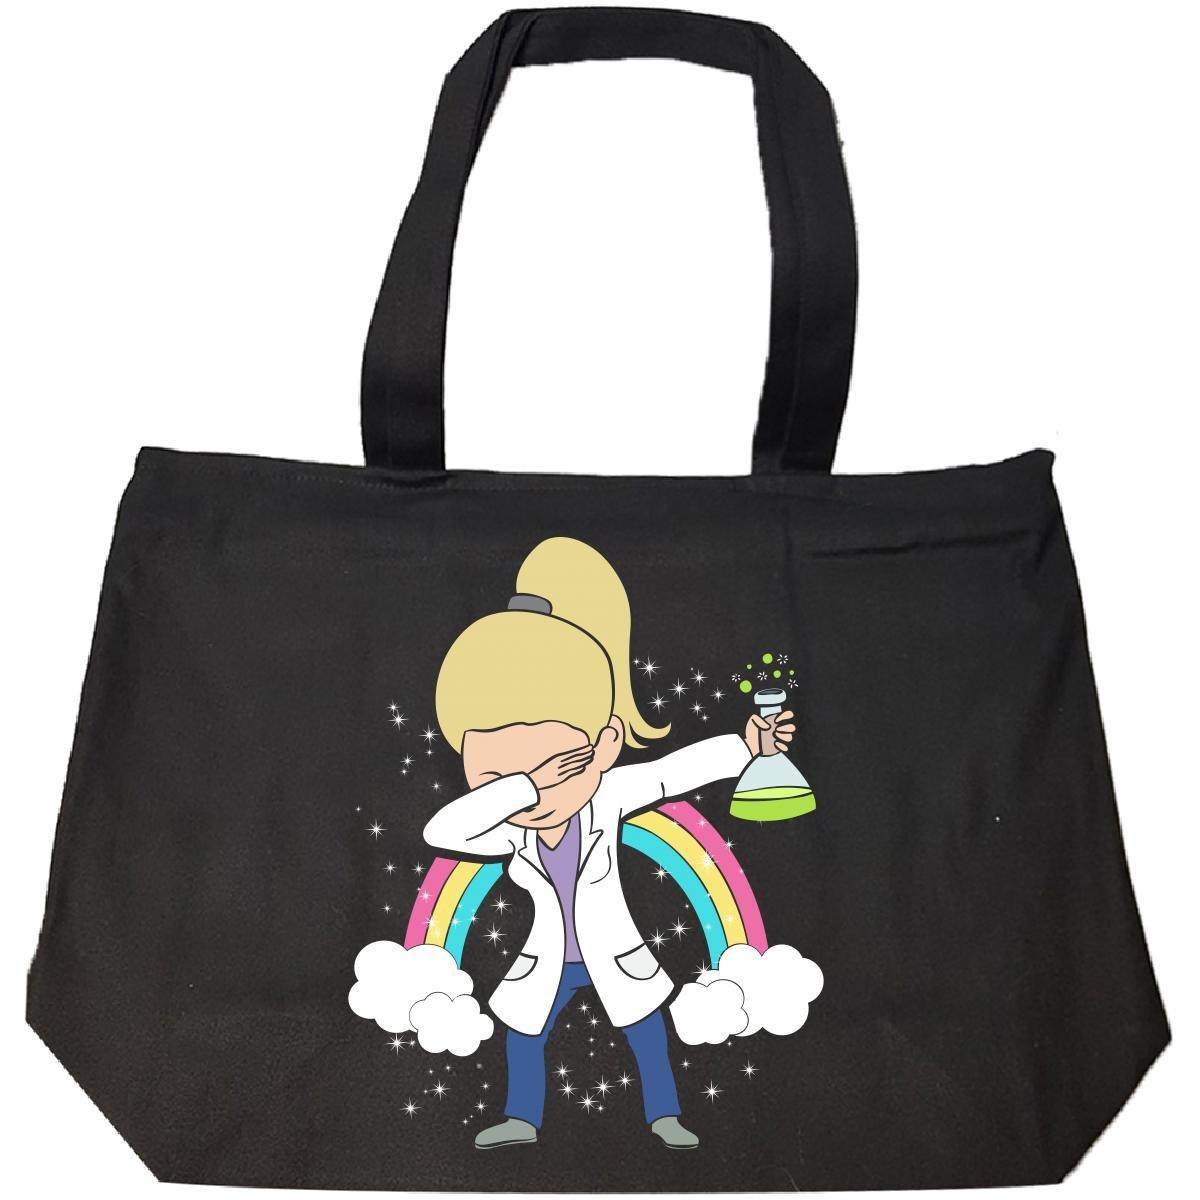 Dabbing Mom Wearing Labcoat Scientist Blonde Hair Gift - Tote Bag With Zip